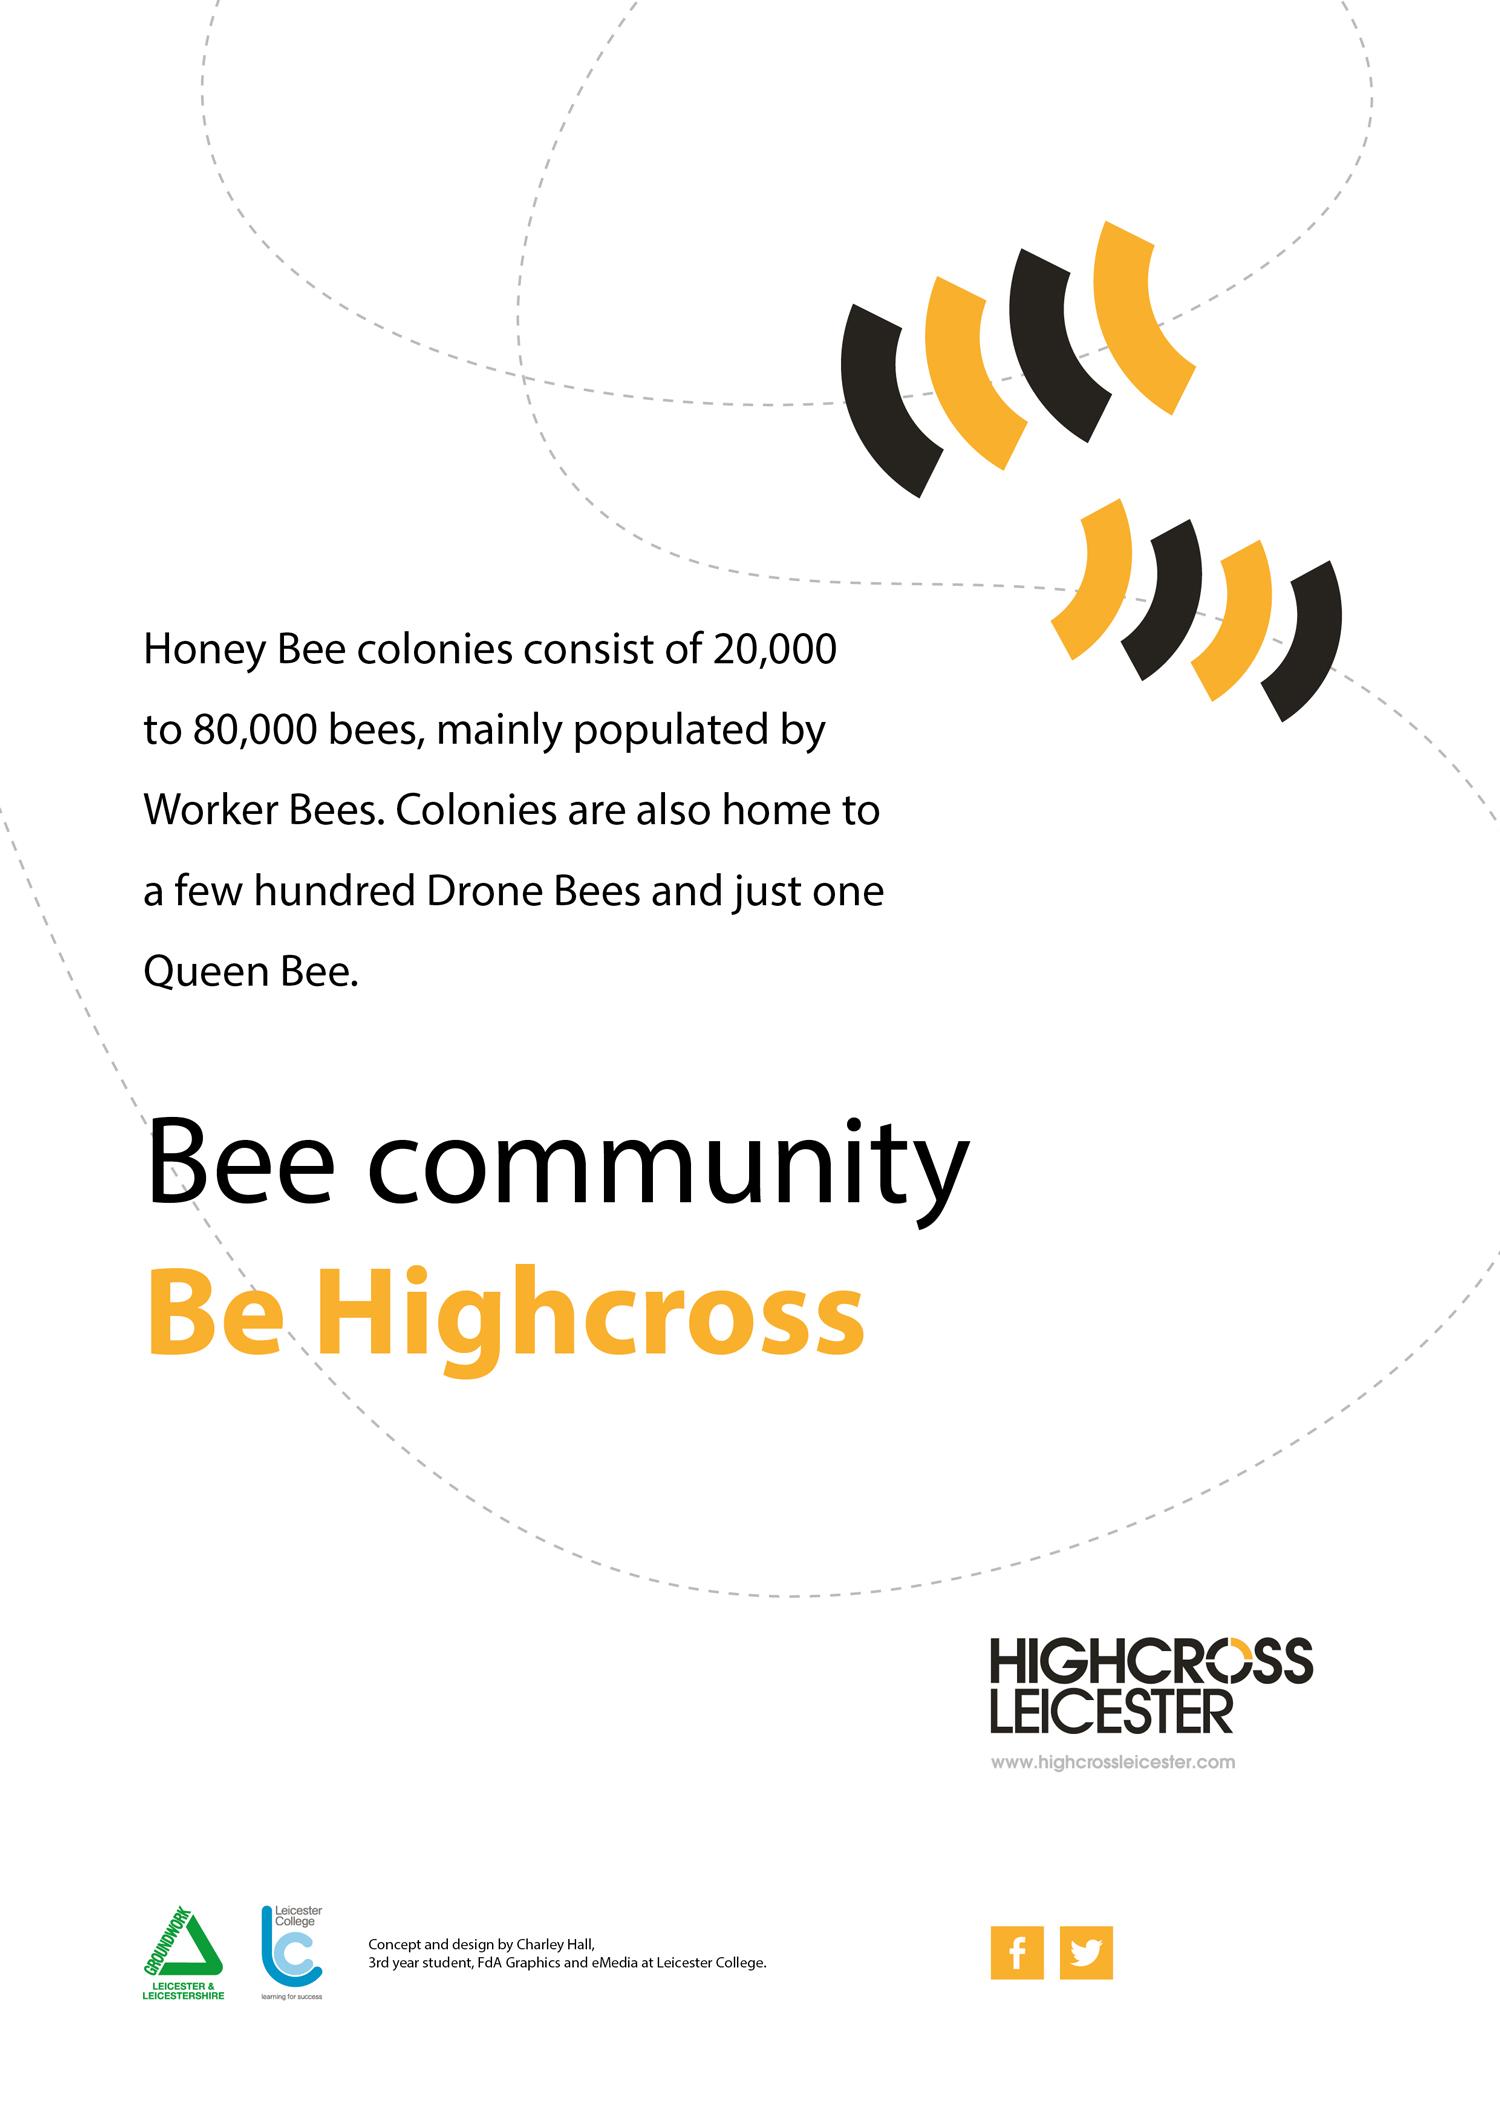 map-highcross-poster-bee-community.jpg